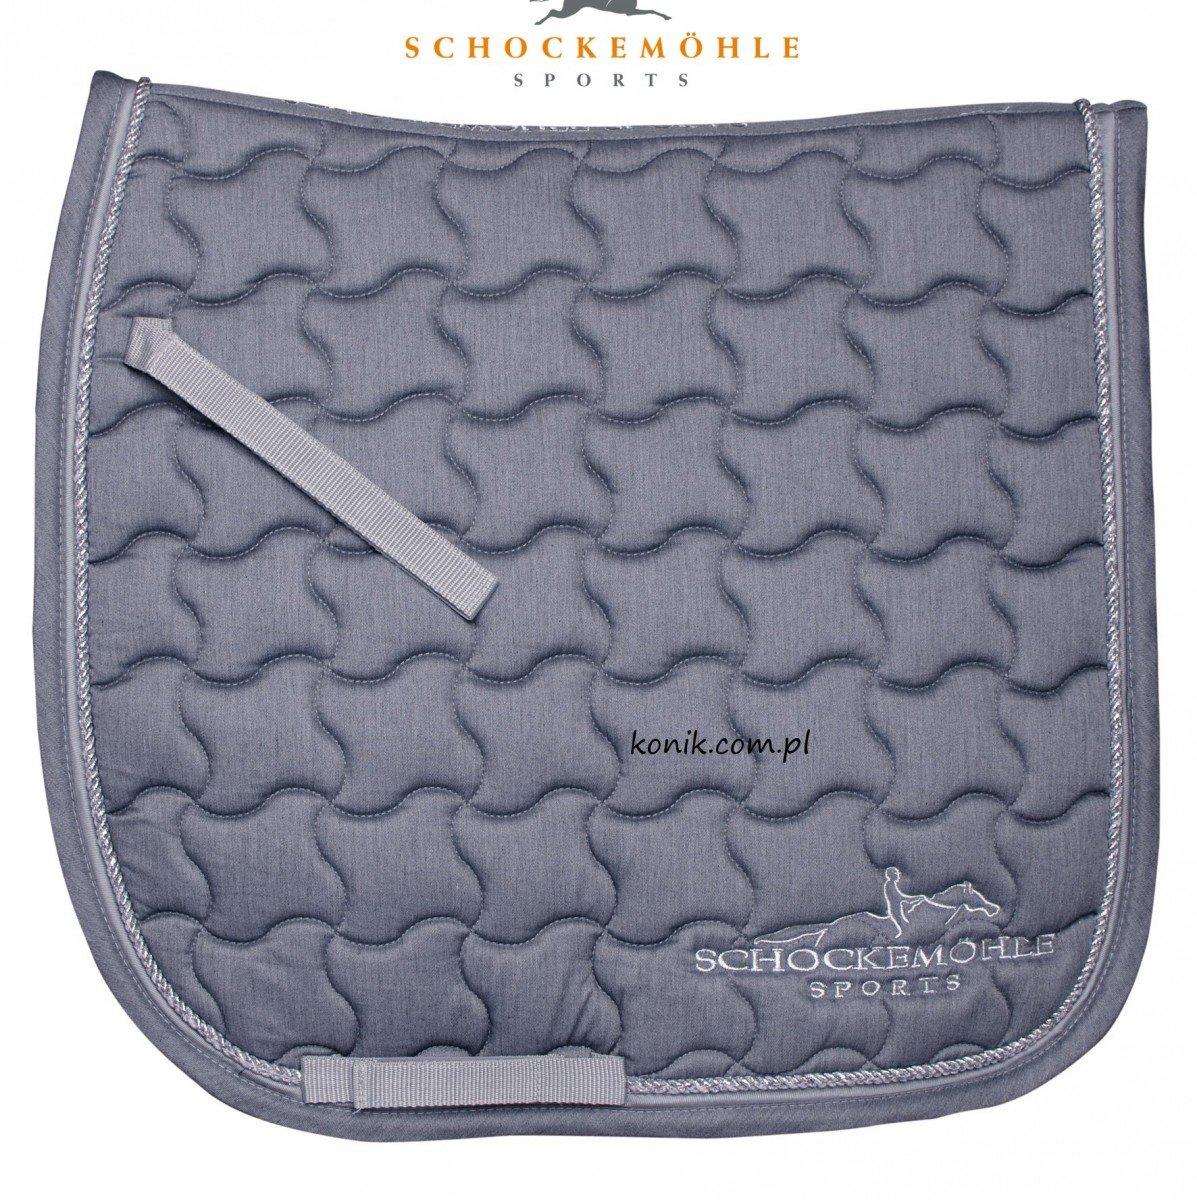 Potnik Champion greymelange/silver - Schockemohle